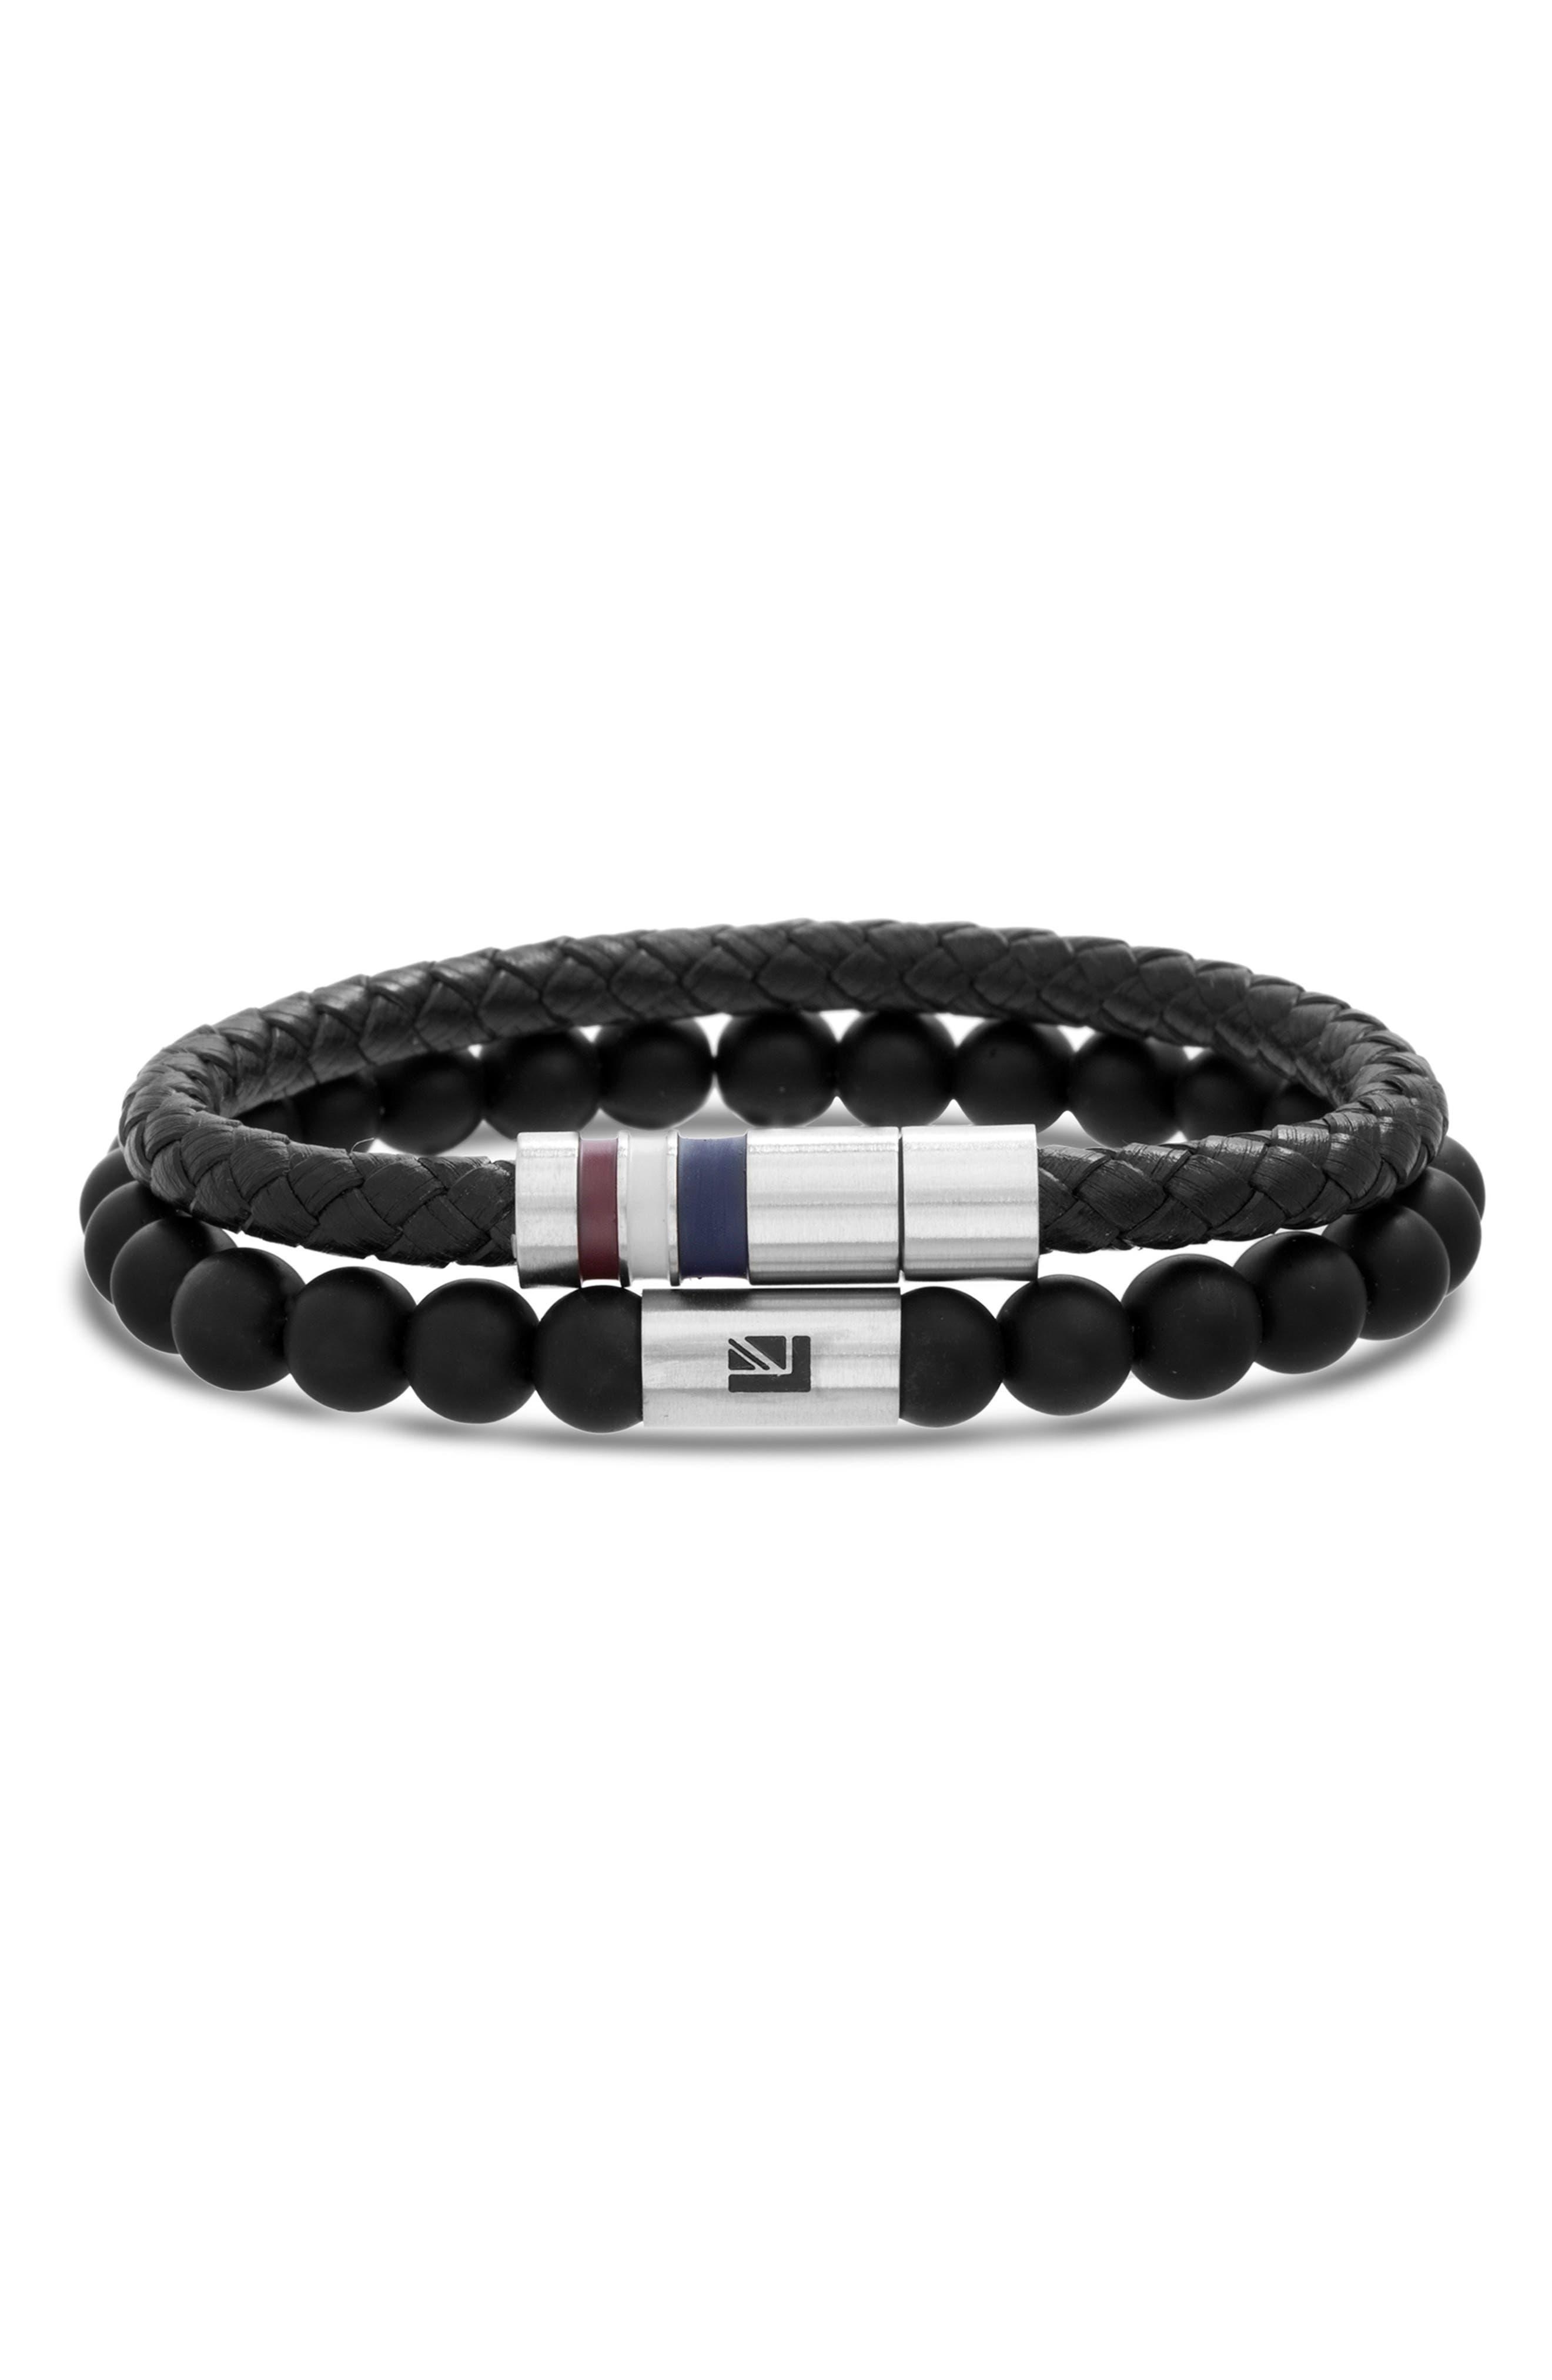 Leather & Bead Bracelet Set,                         Main,                         color, BLACK